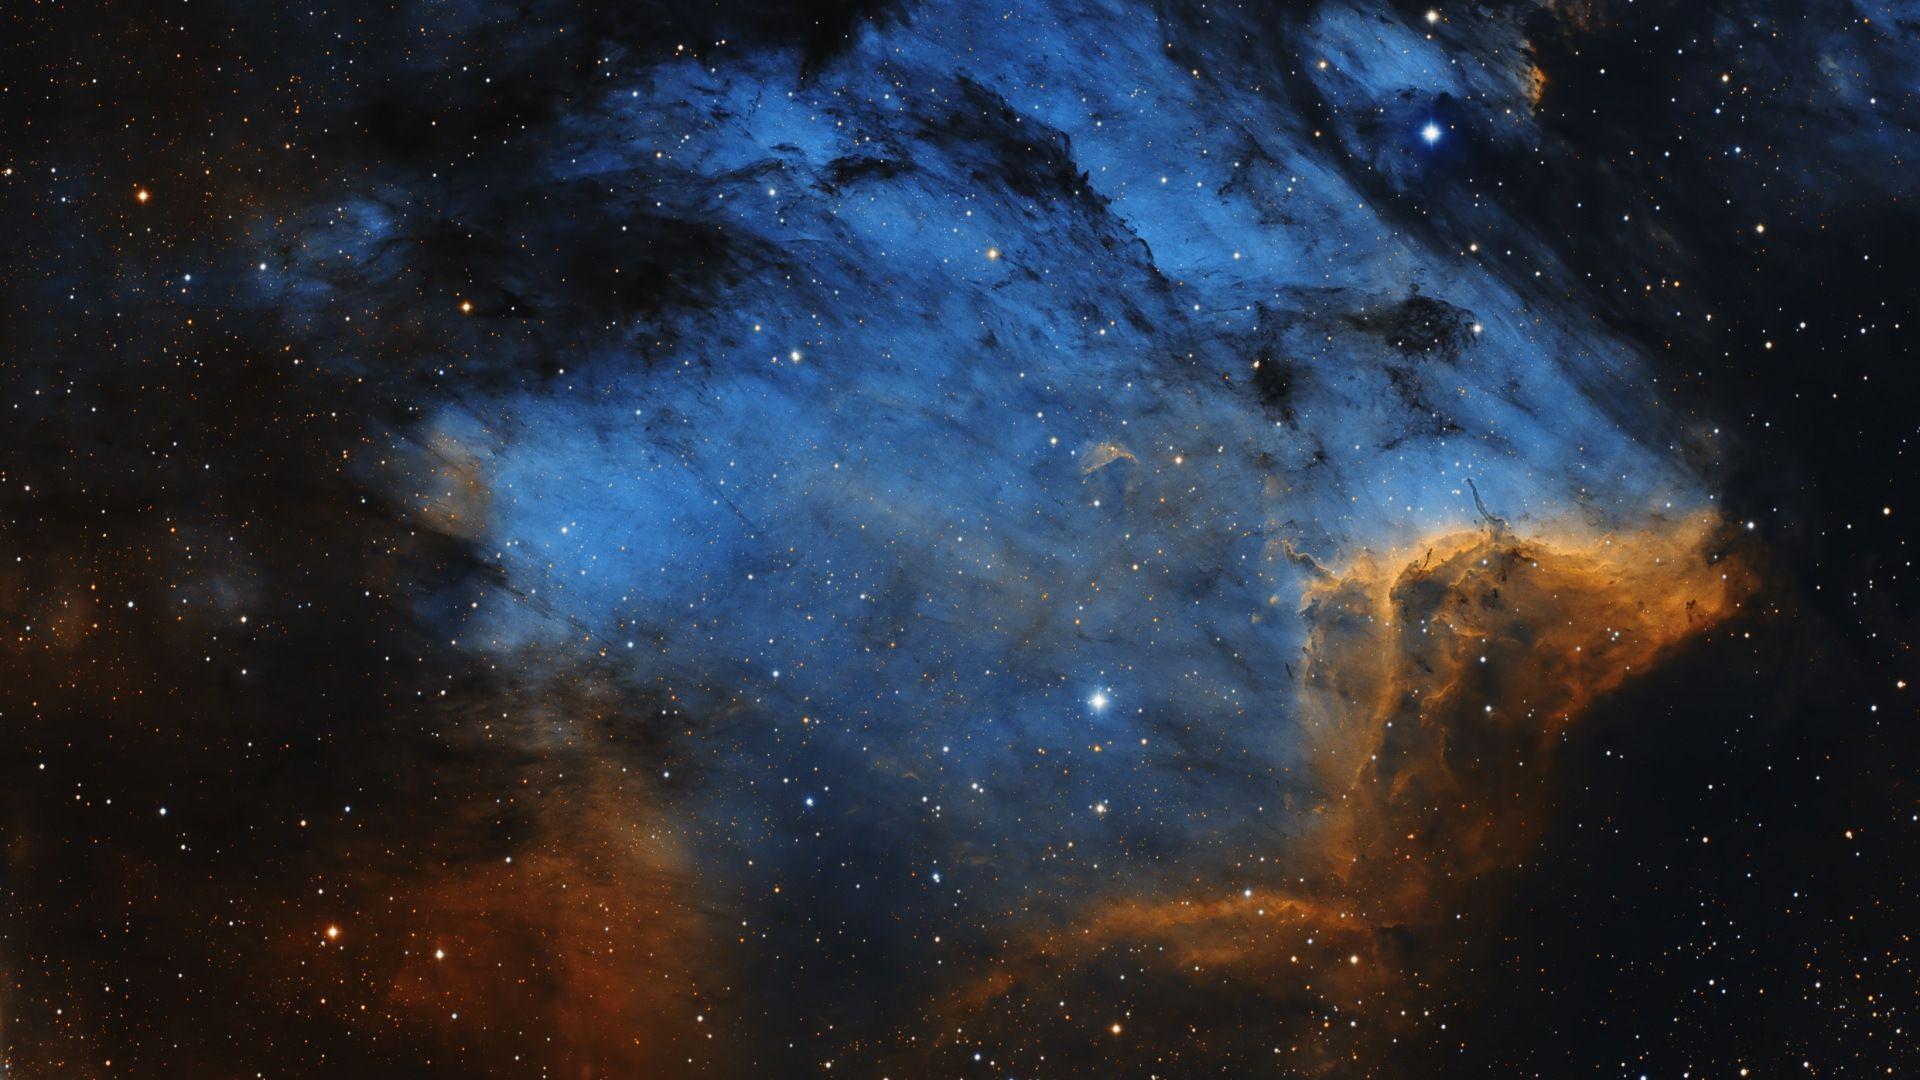 Nebula Clouds Space Galaxy Stars 1920x1080 Wallpaper Hubble Telescope